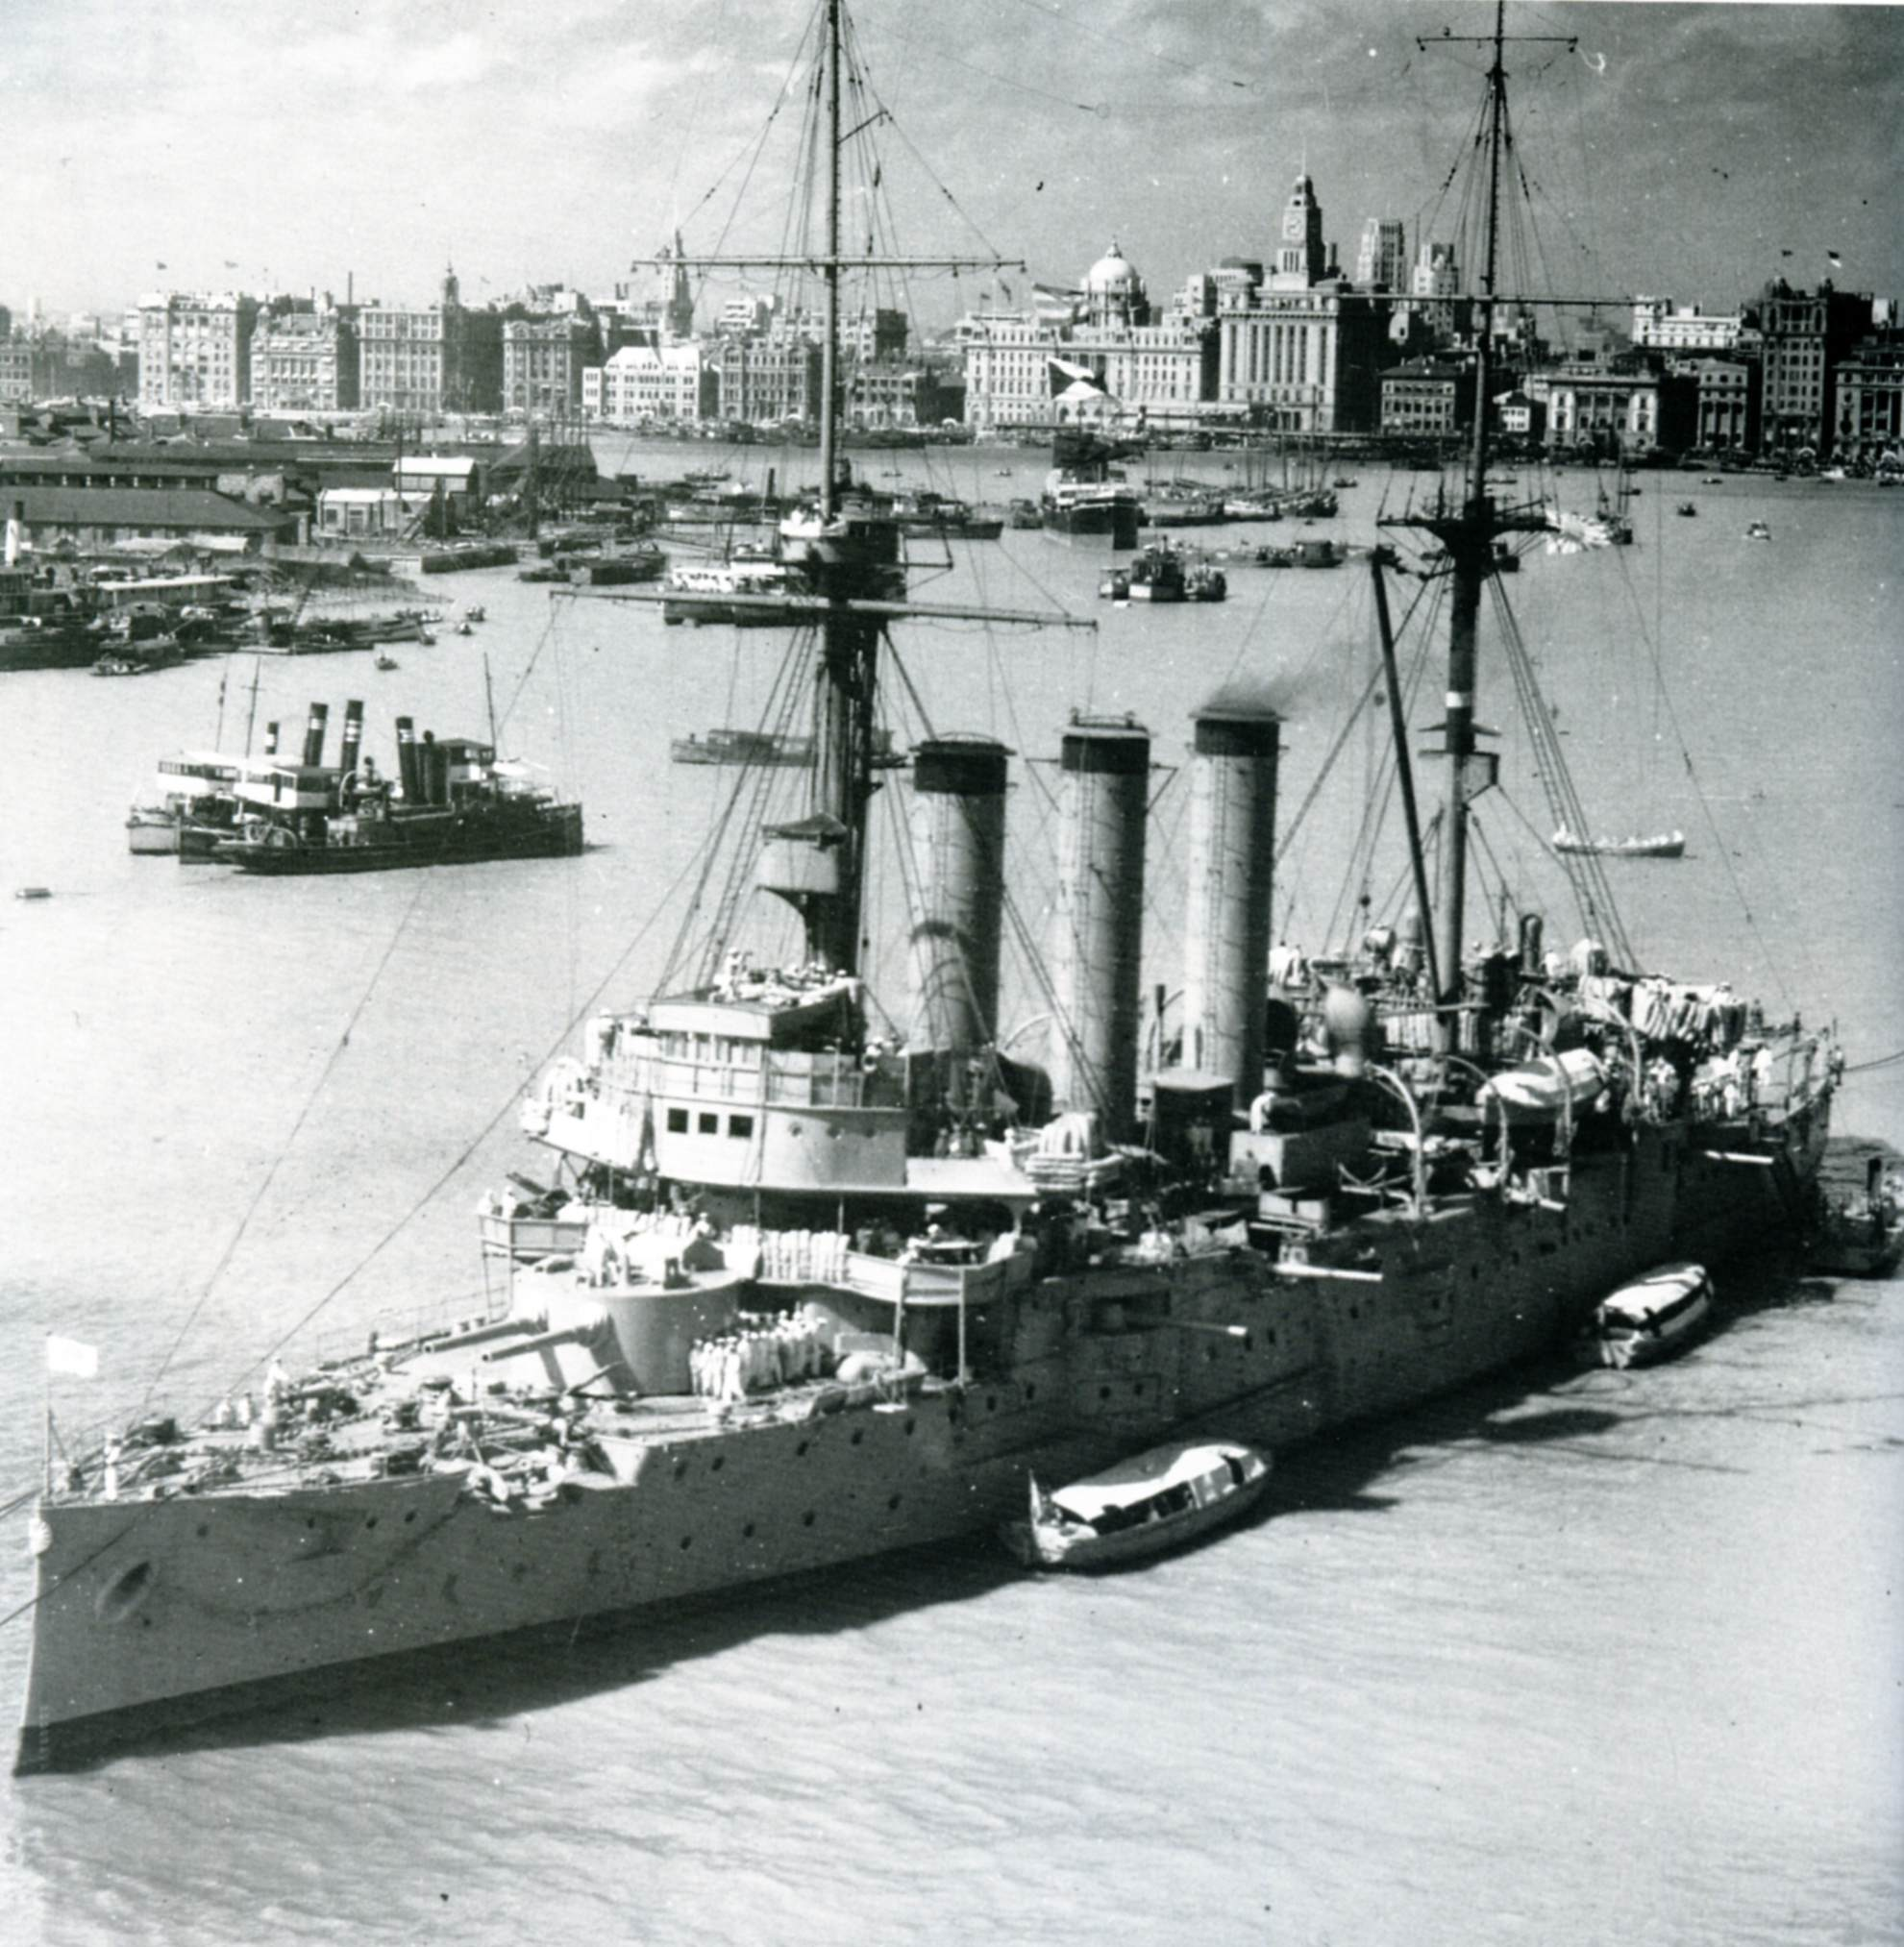 The Japanese cruiser Izumo in Shanghai in 1937. (Public Domain)